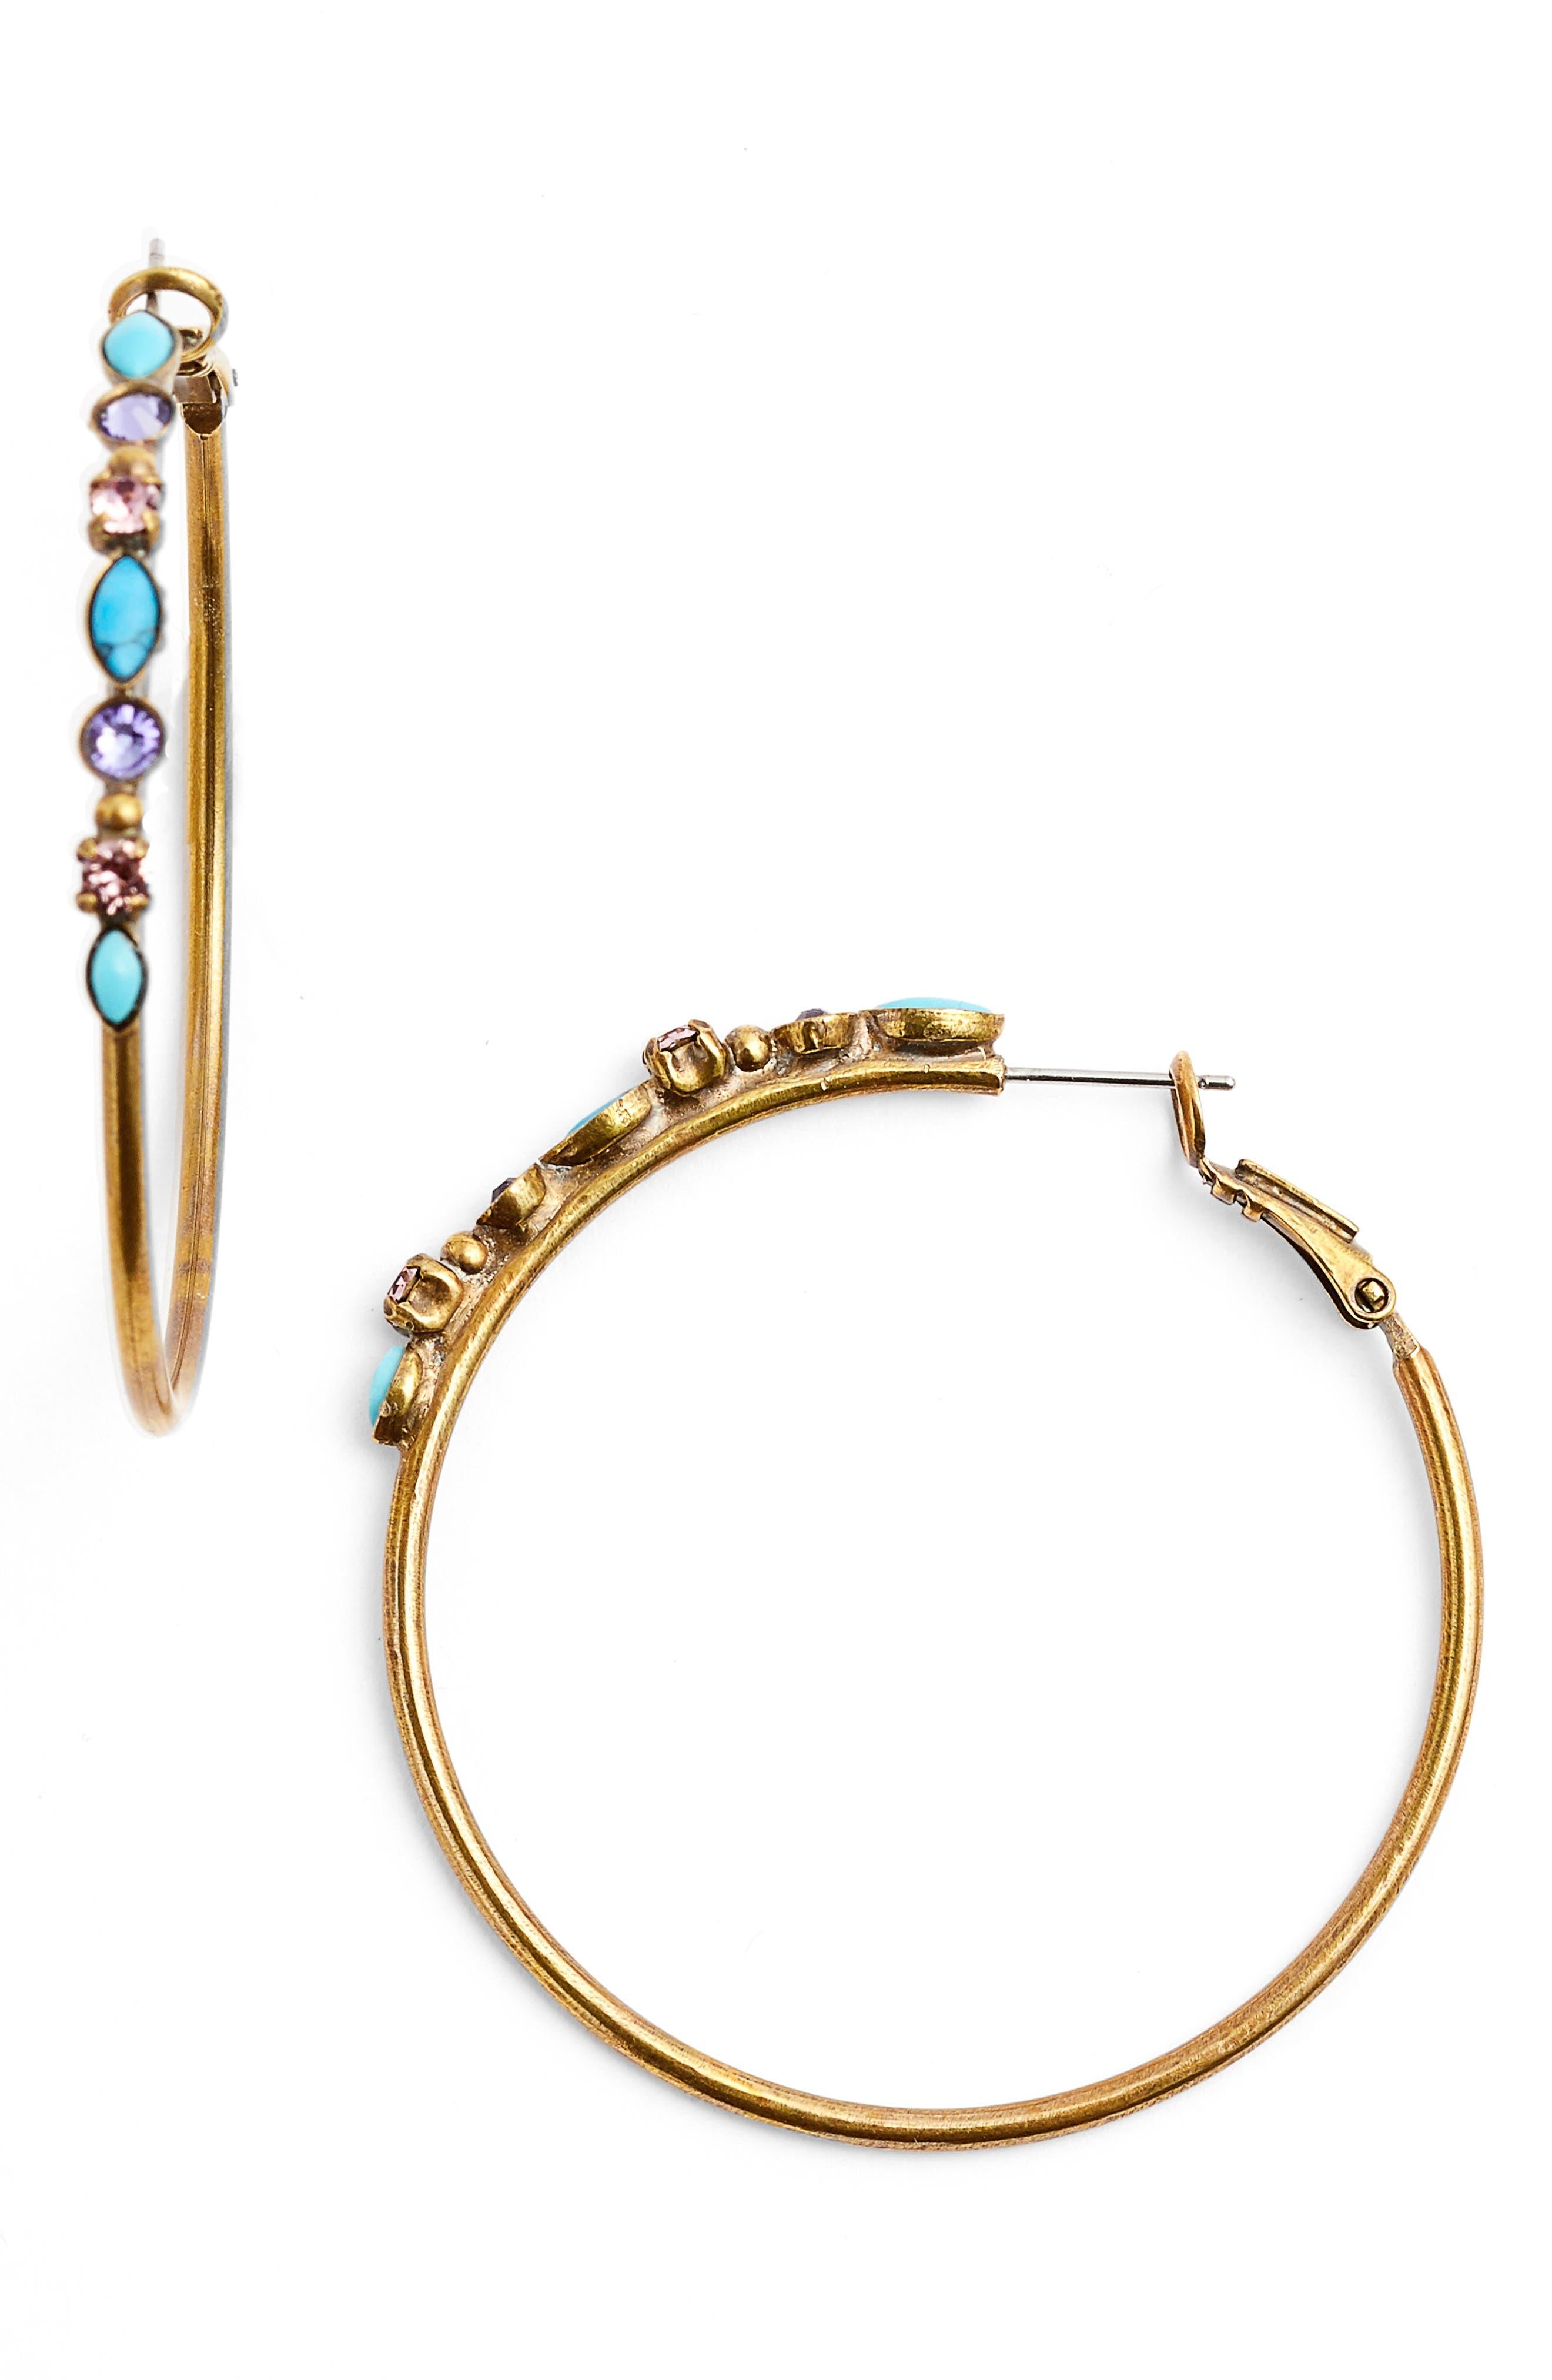 Main Image - Sorrelli Mixed Media Large Hoop Earrings